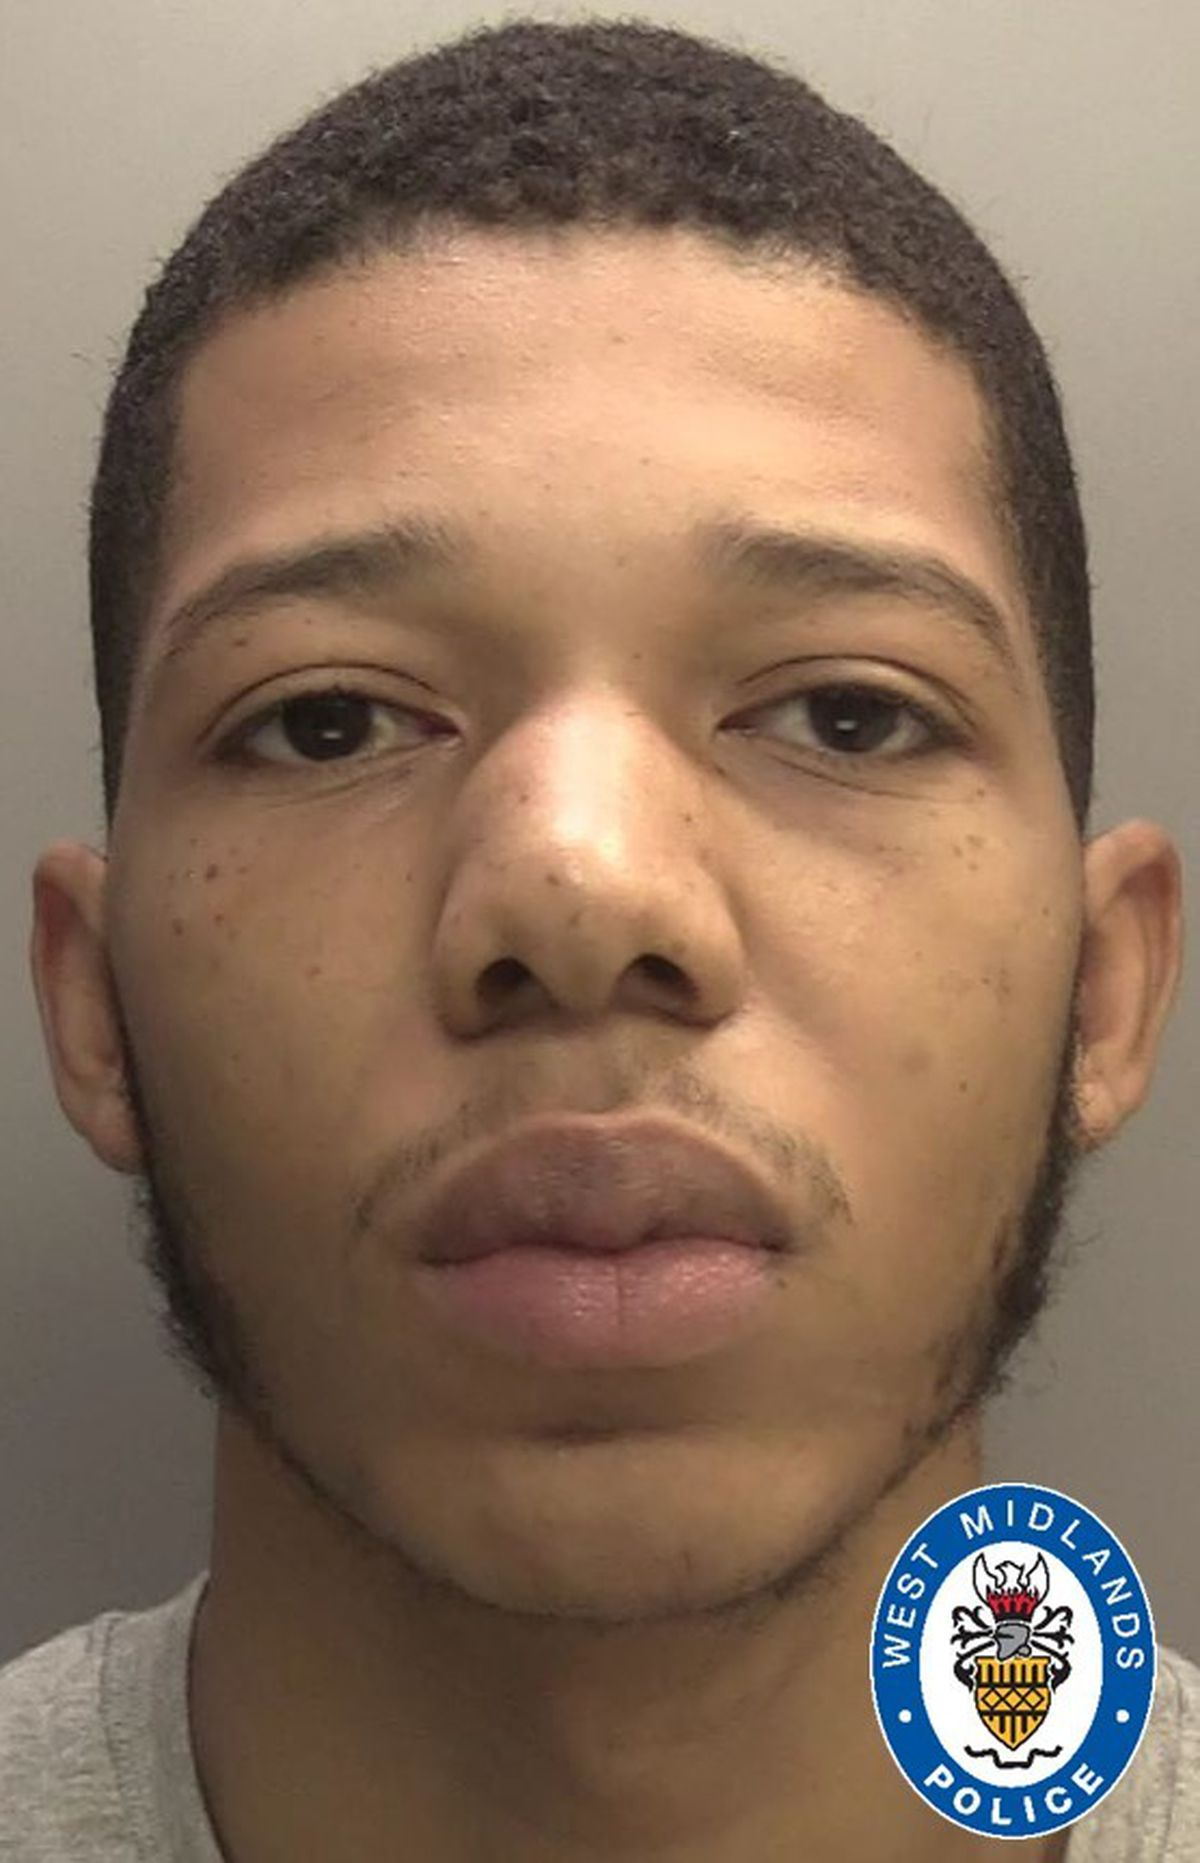 Niles Bennett from Erdington was jailed for nine-and-a-half years